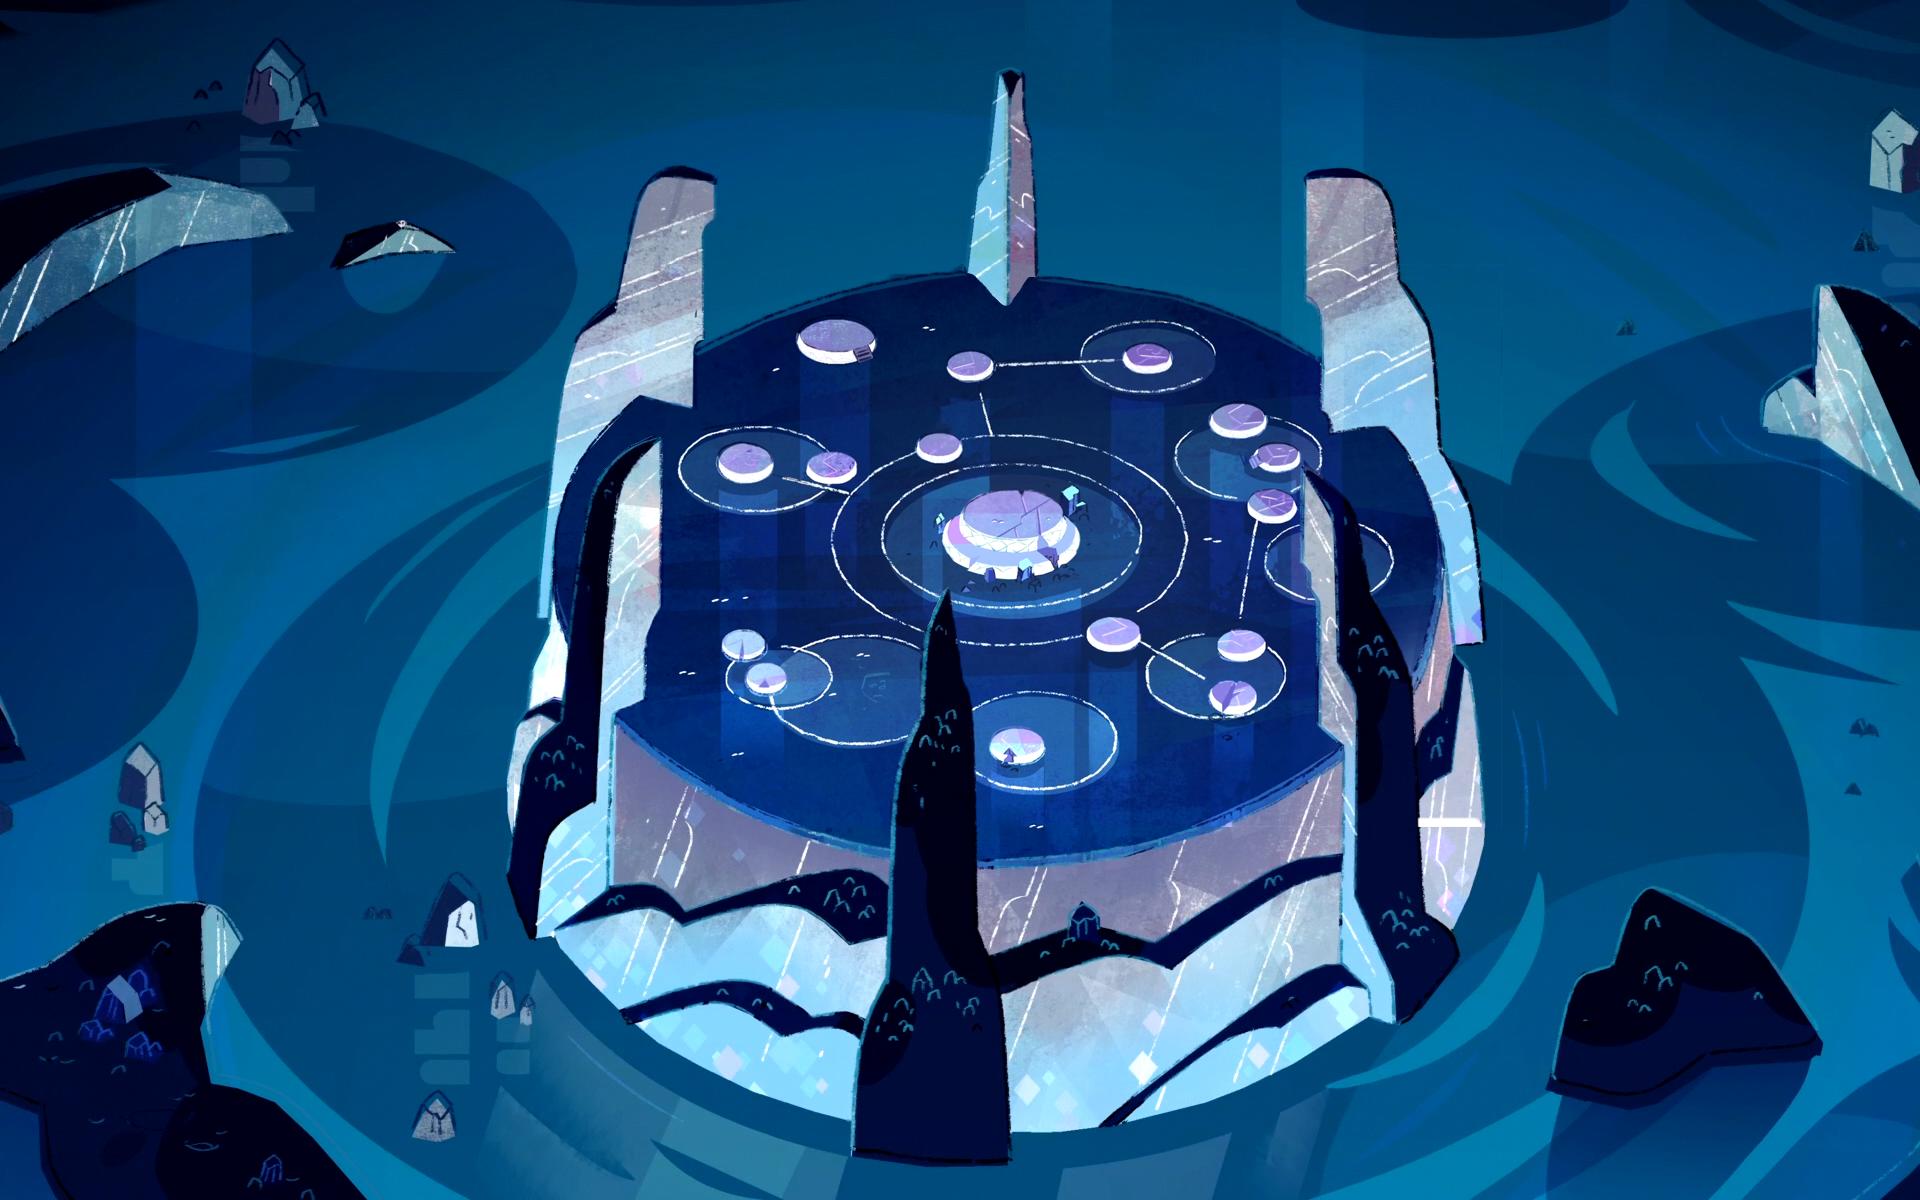 Download Wallpaper High Quality Steven Universe - illustration-anime-space-blue-cartoon-Steven-Universe-screenshot-computer-wallpaper-80664  Best Photo Reference_626863.png